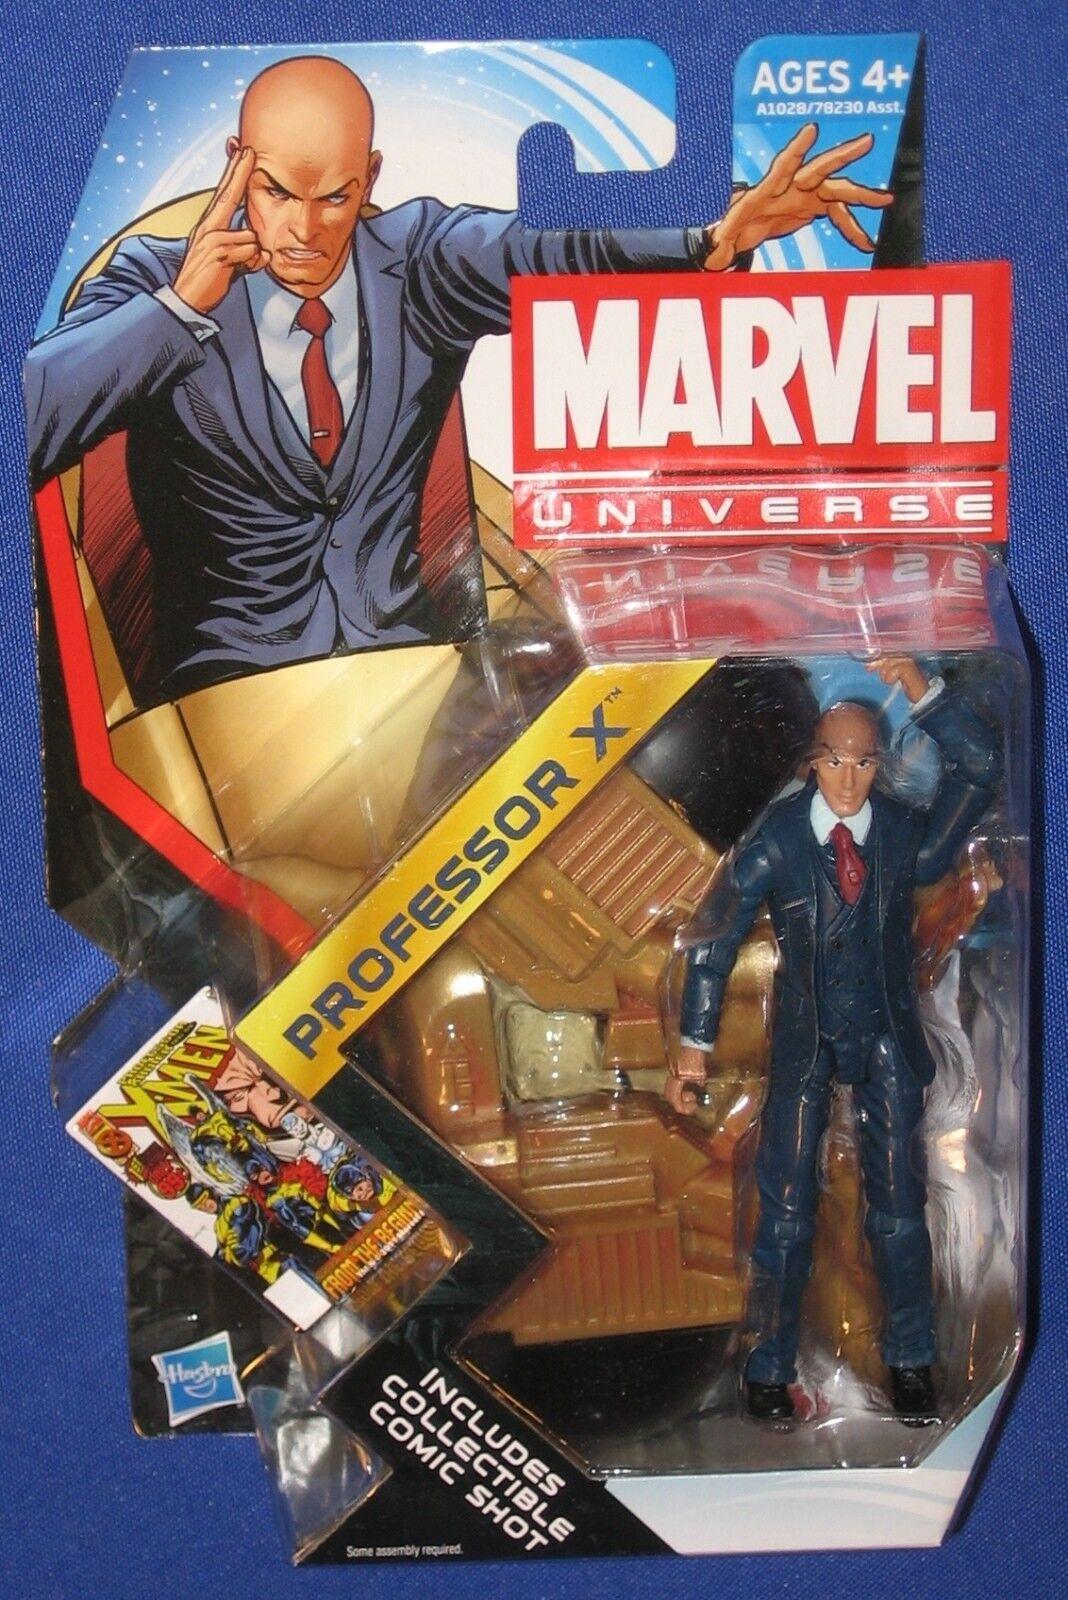 Marvel - professor x 4